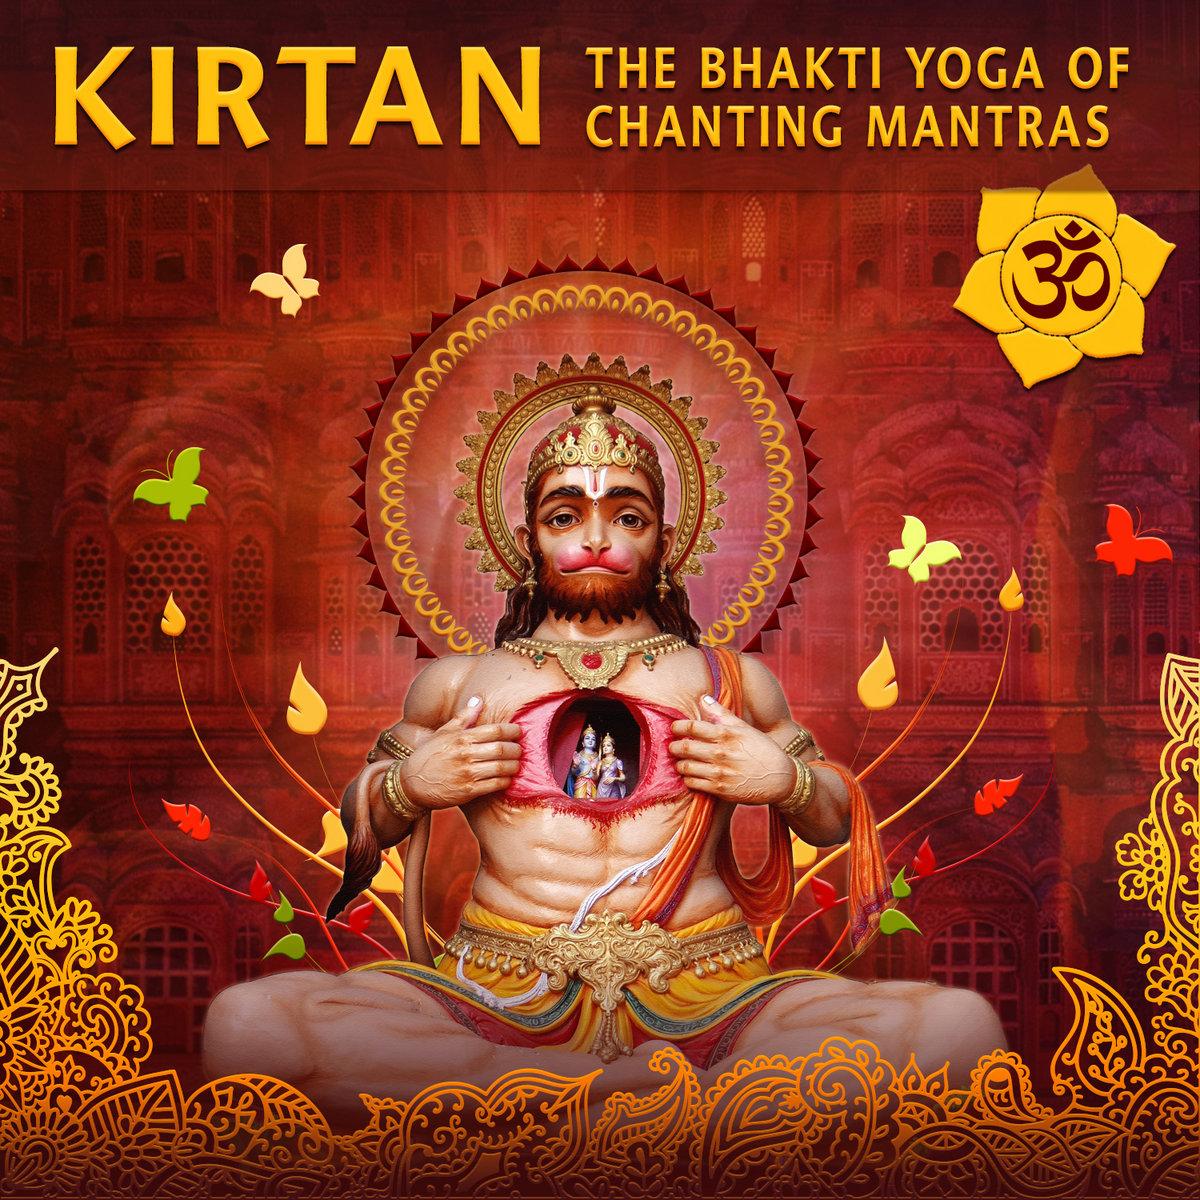 Kirtan The Bhakti Yoga Of Chanting Mantras Various Artists White Swan Records